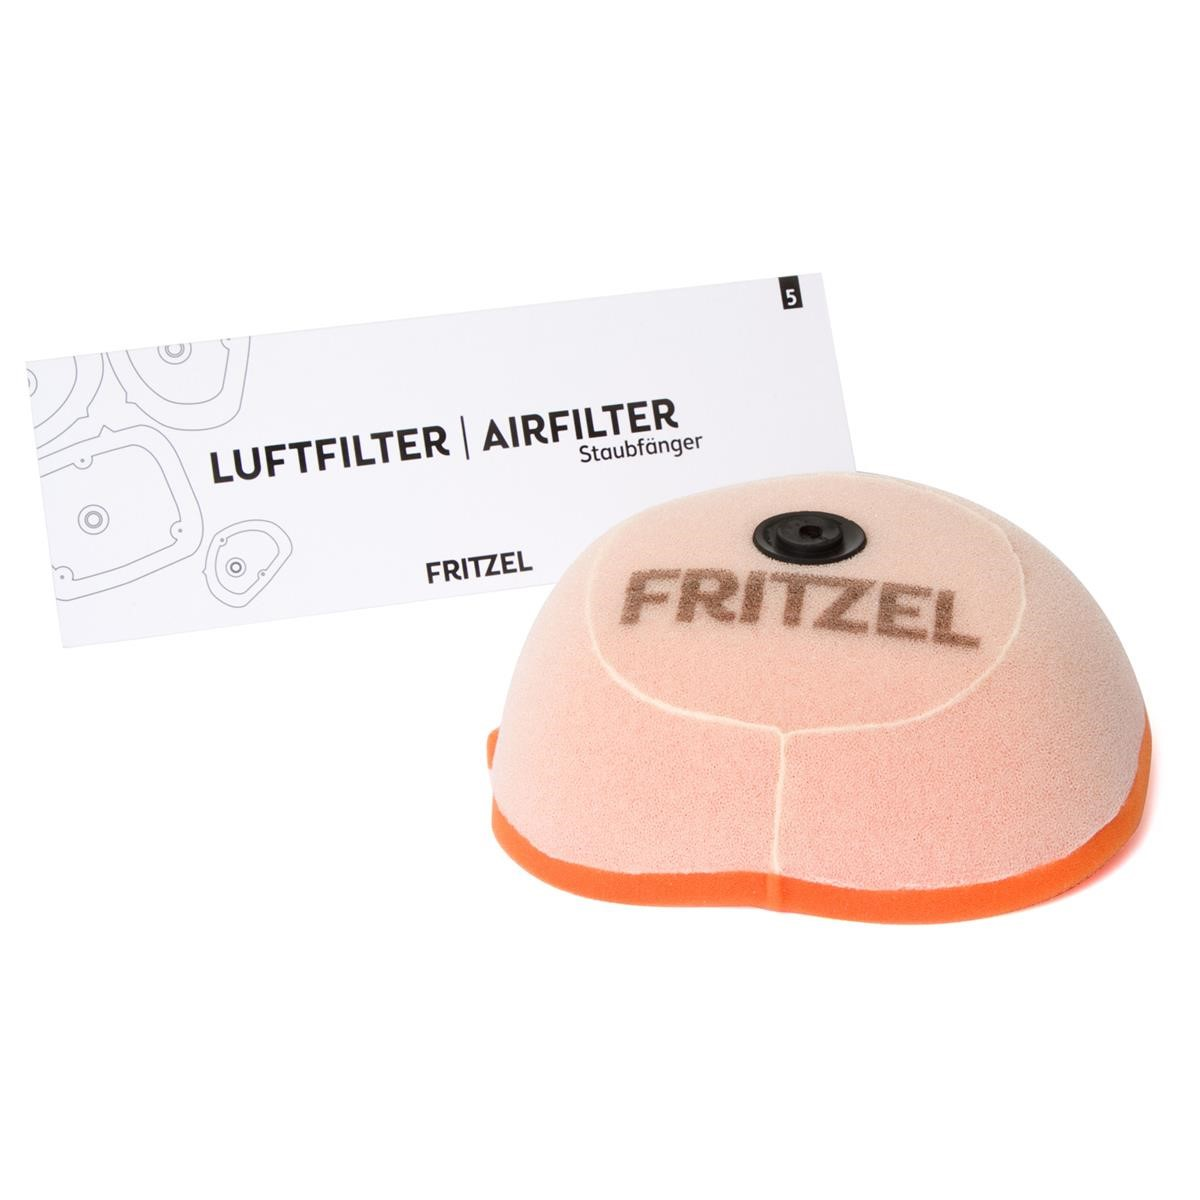 FRITZEL Luftfilter Staubfänger KTM EXC 125/200/250/300, EXC-F 250/400/450/500, SX-F 250/350/450, Husaberg FE/TE, Husqvarna FC/TE/FE